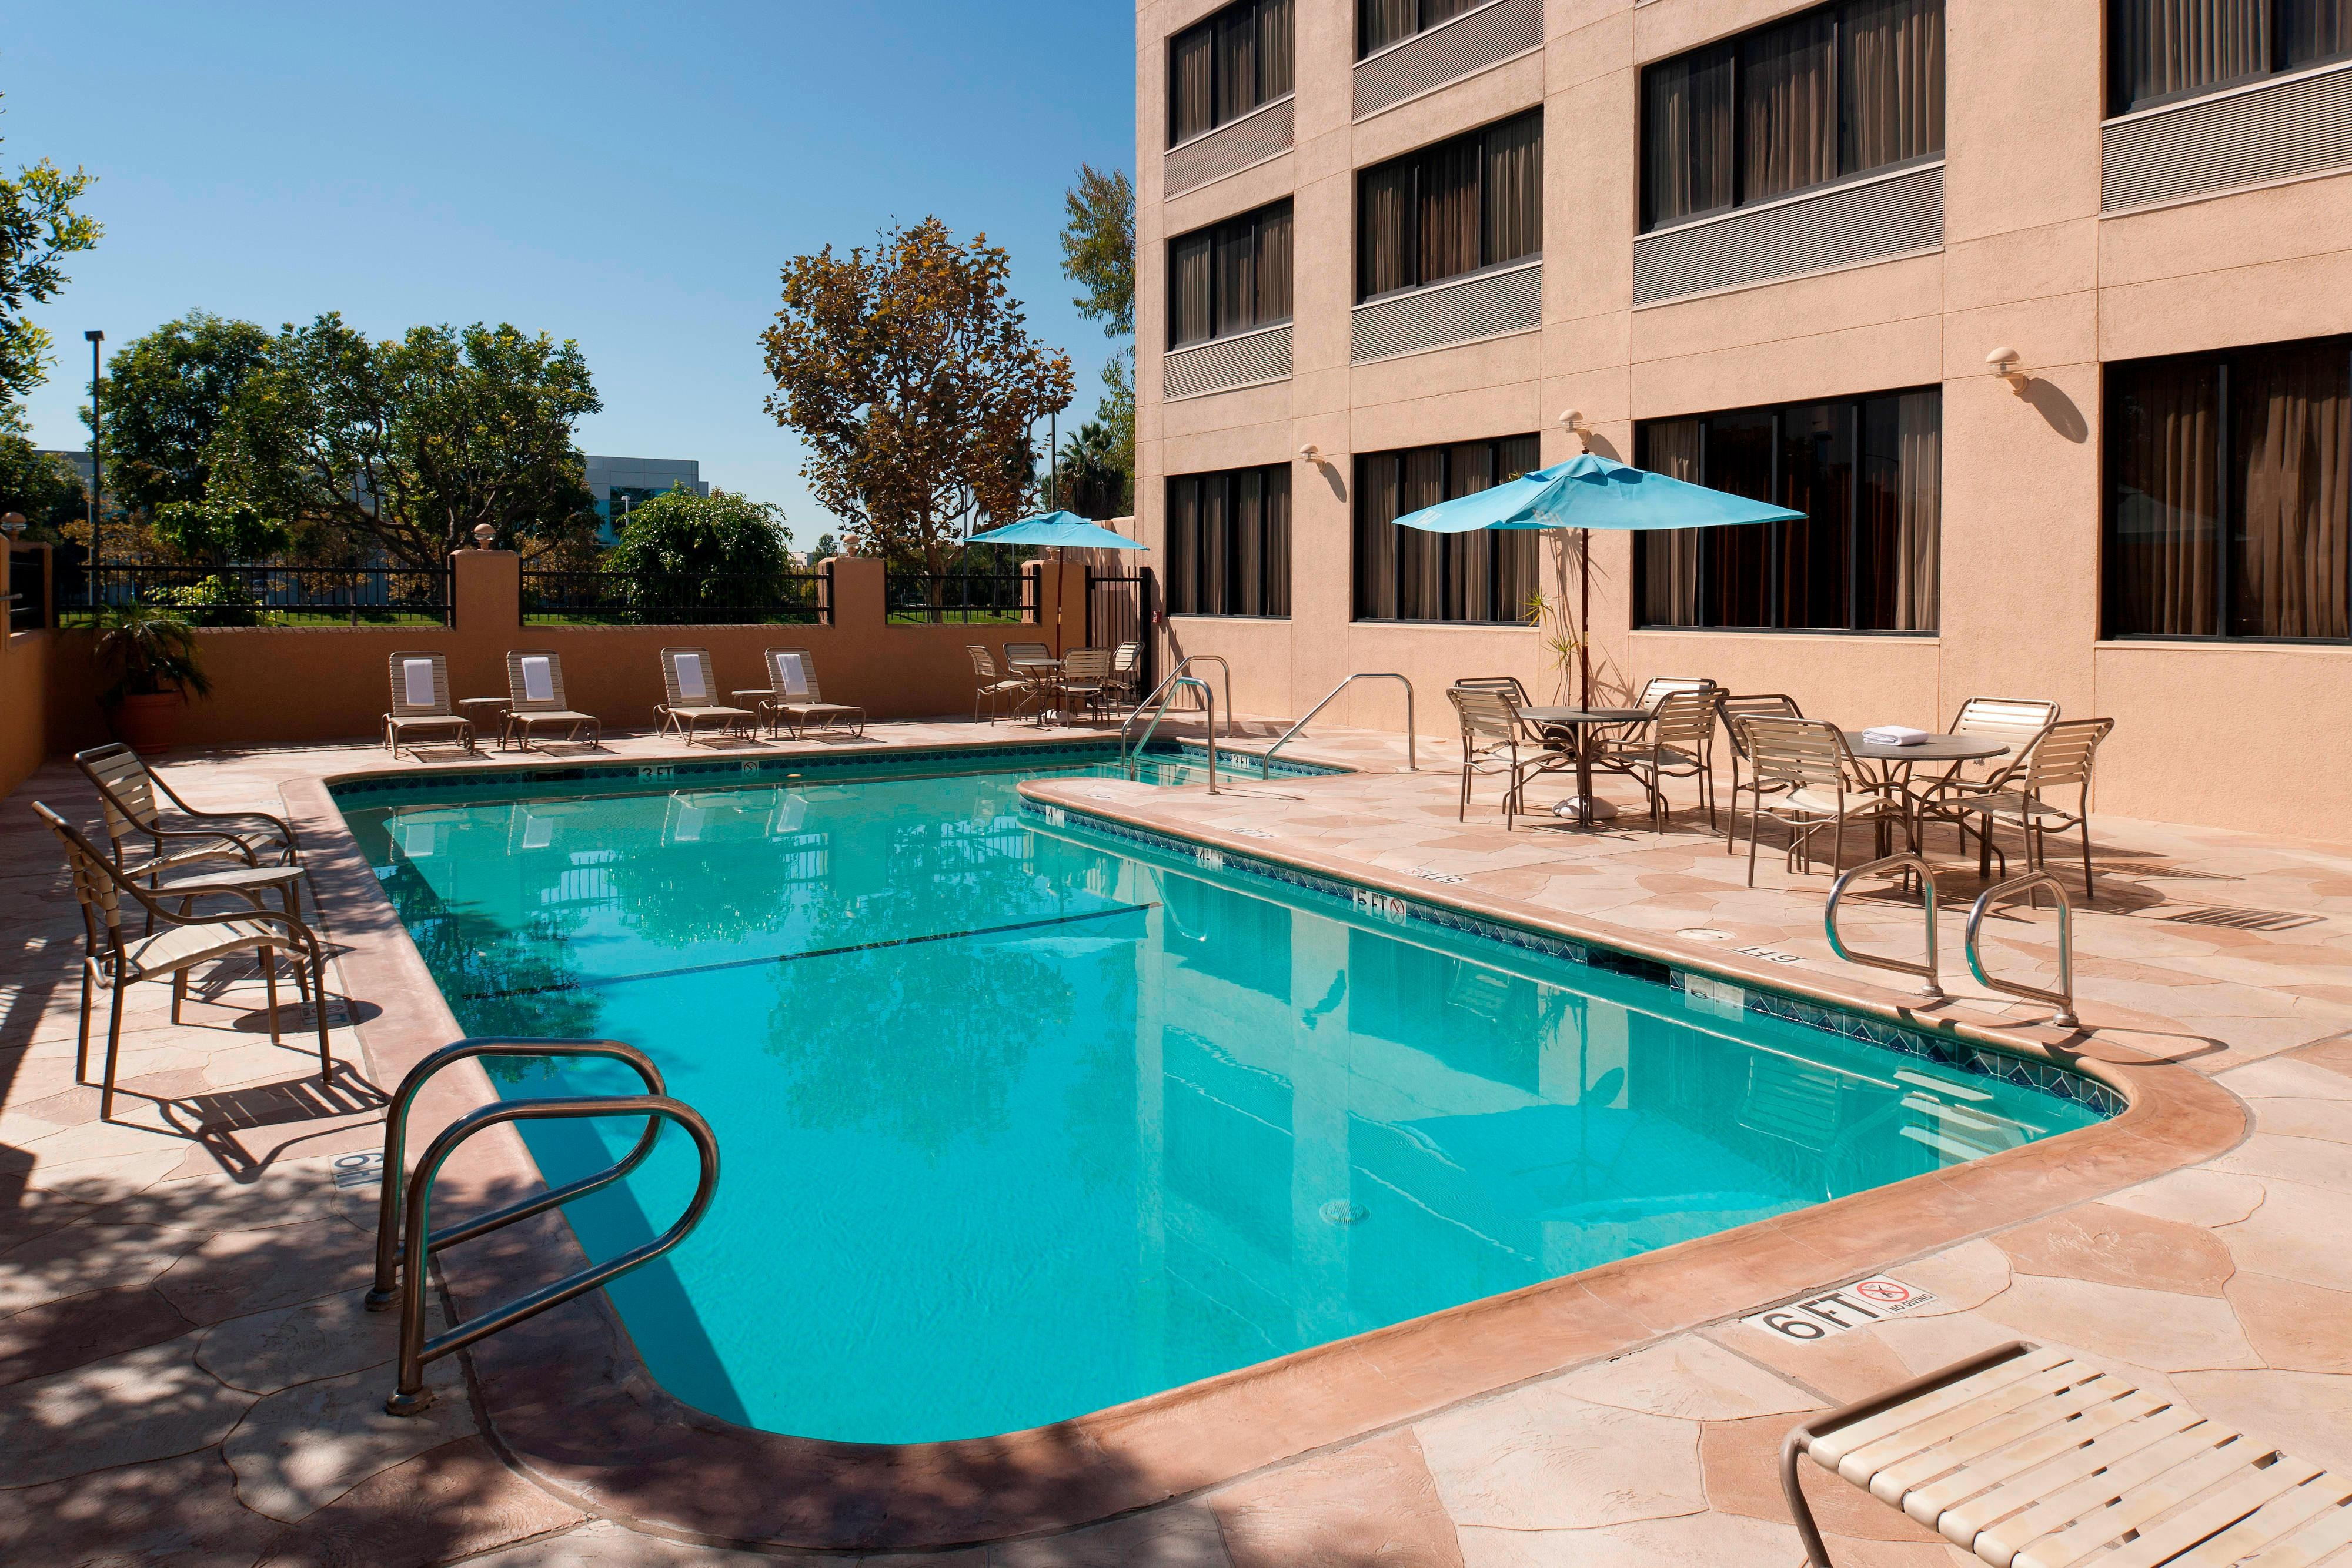 Pool - Hotels in Cypress, CA